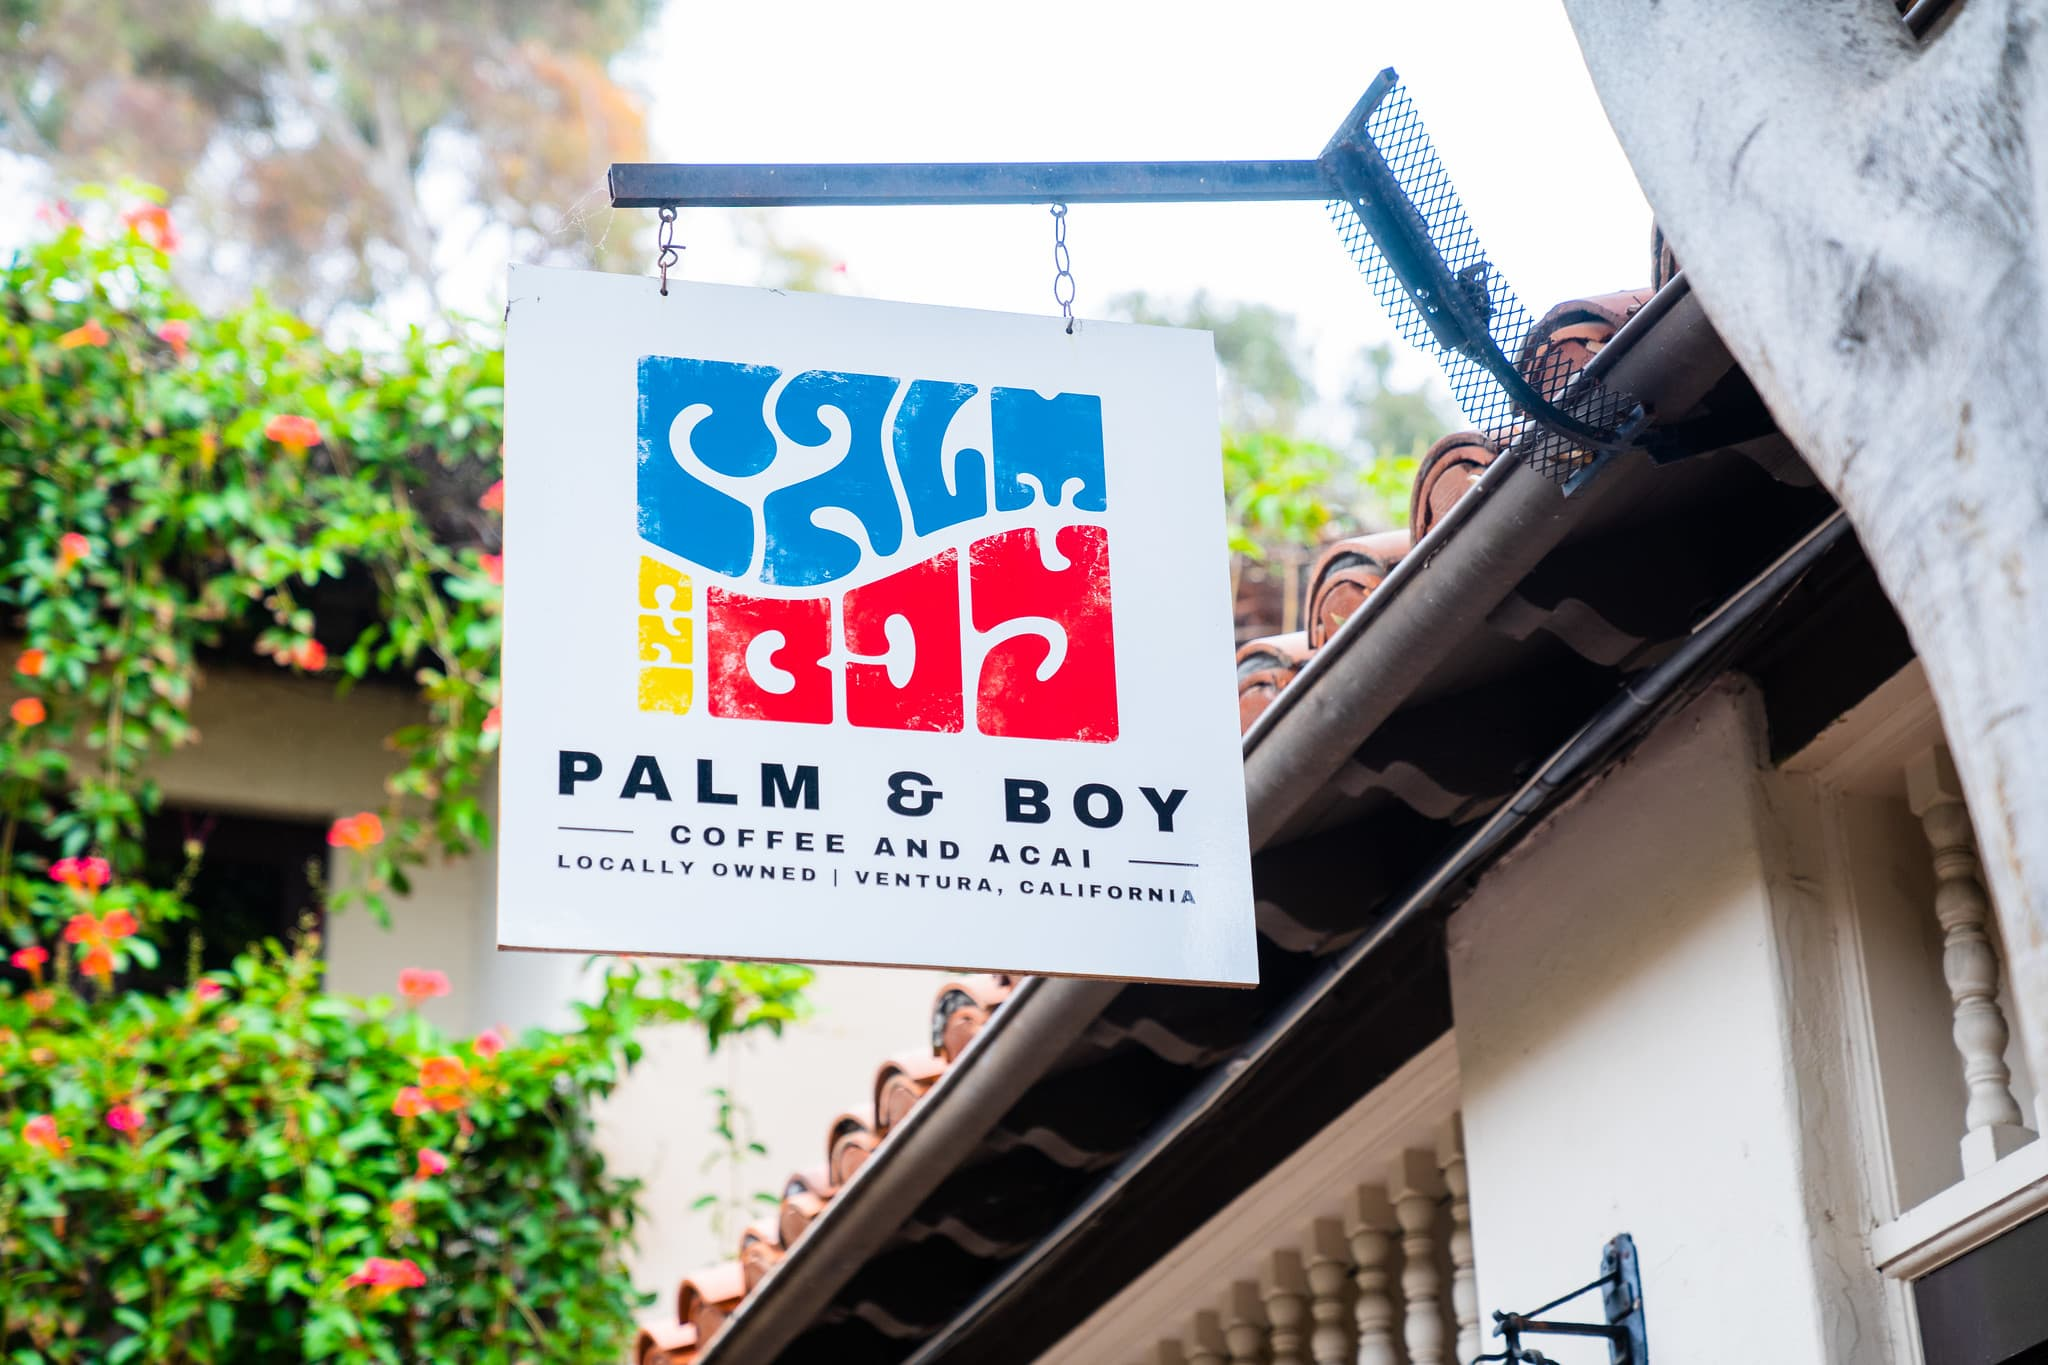 palm & boy coffee and acai